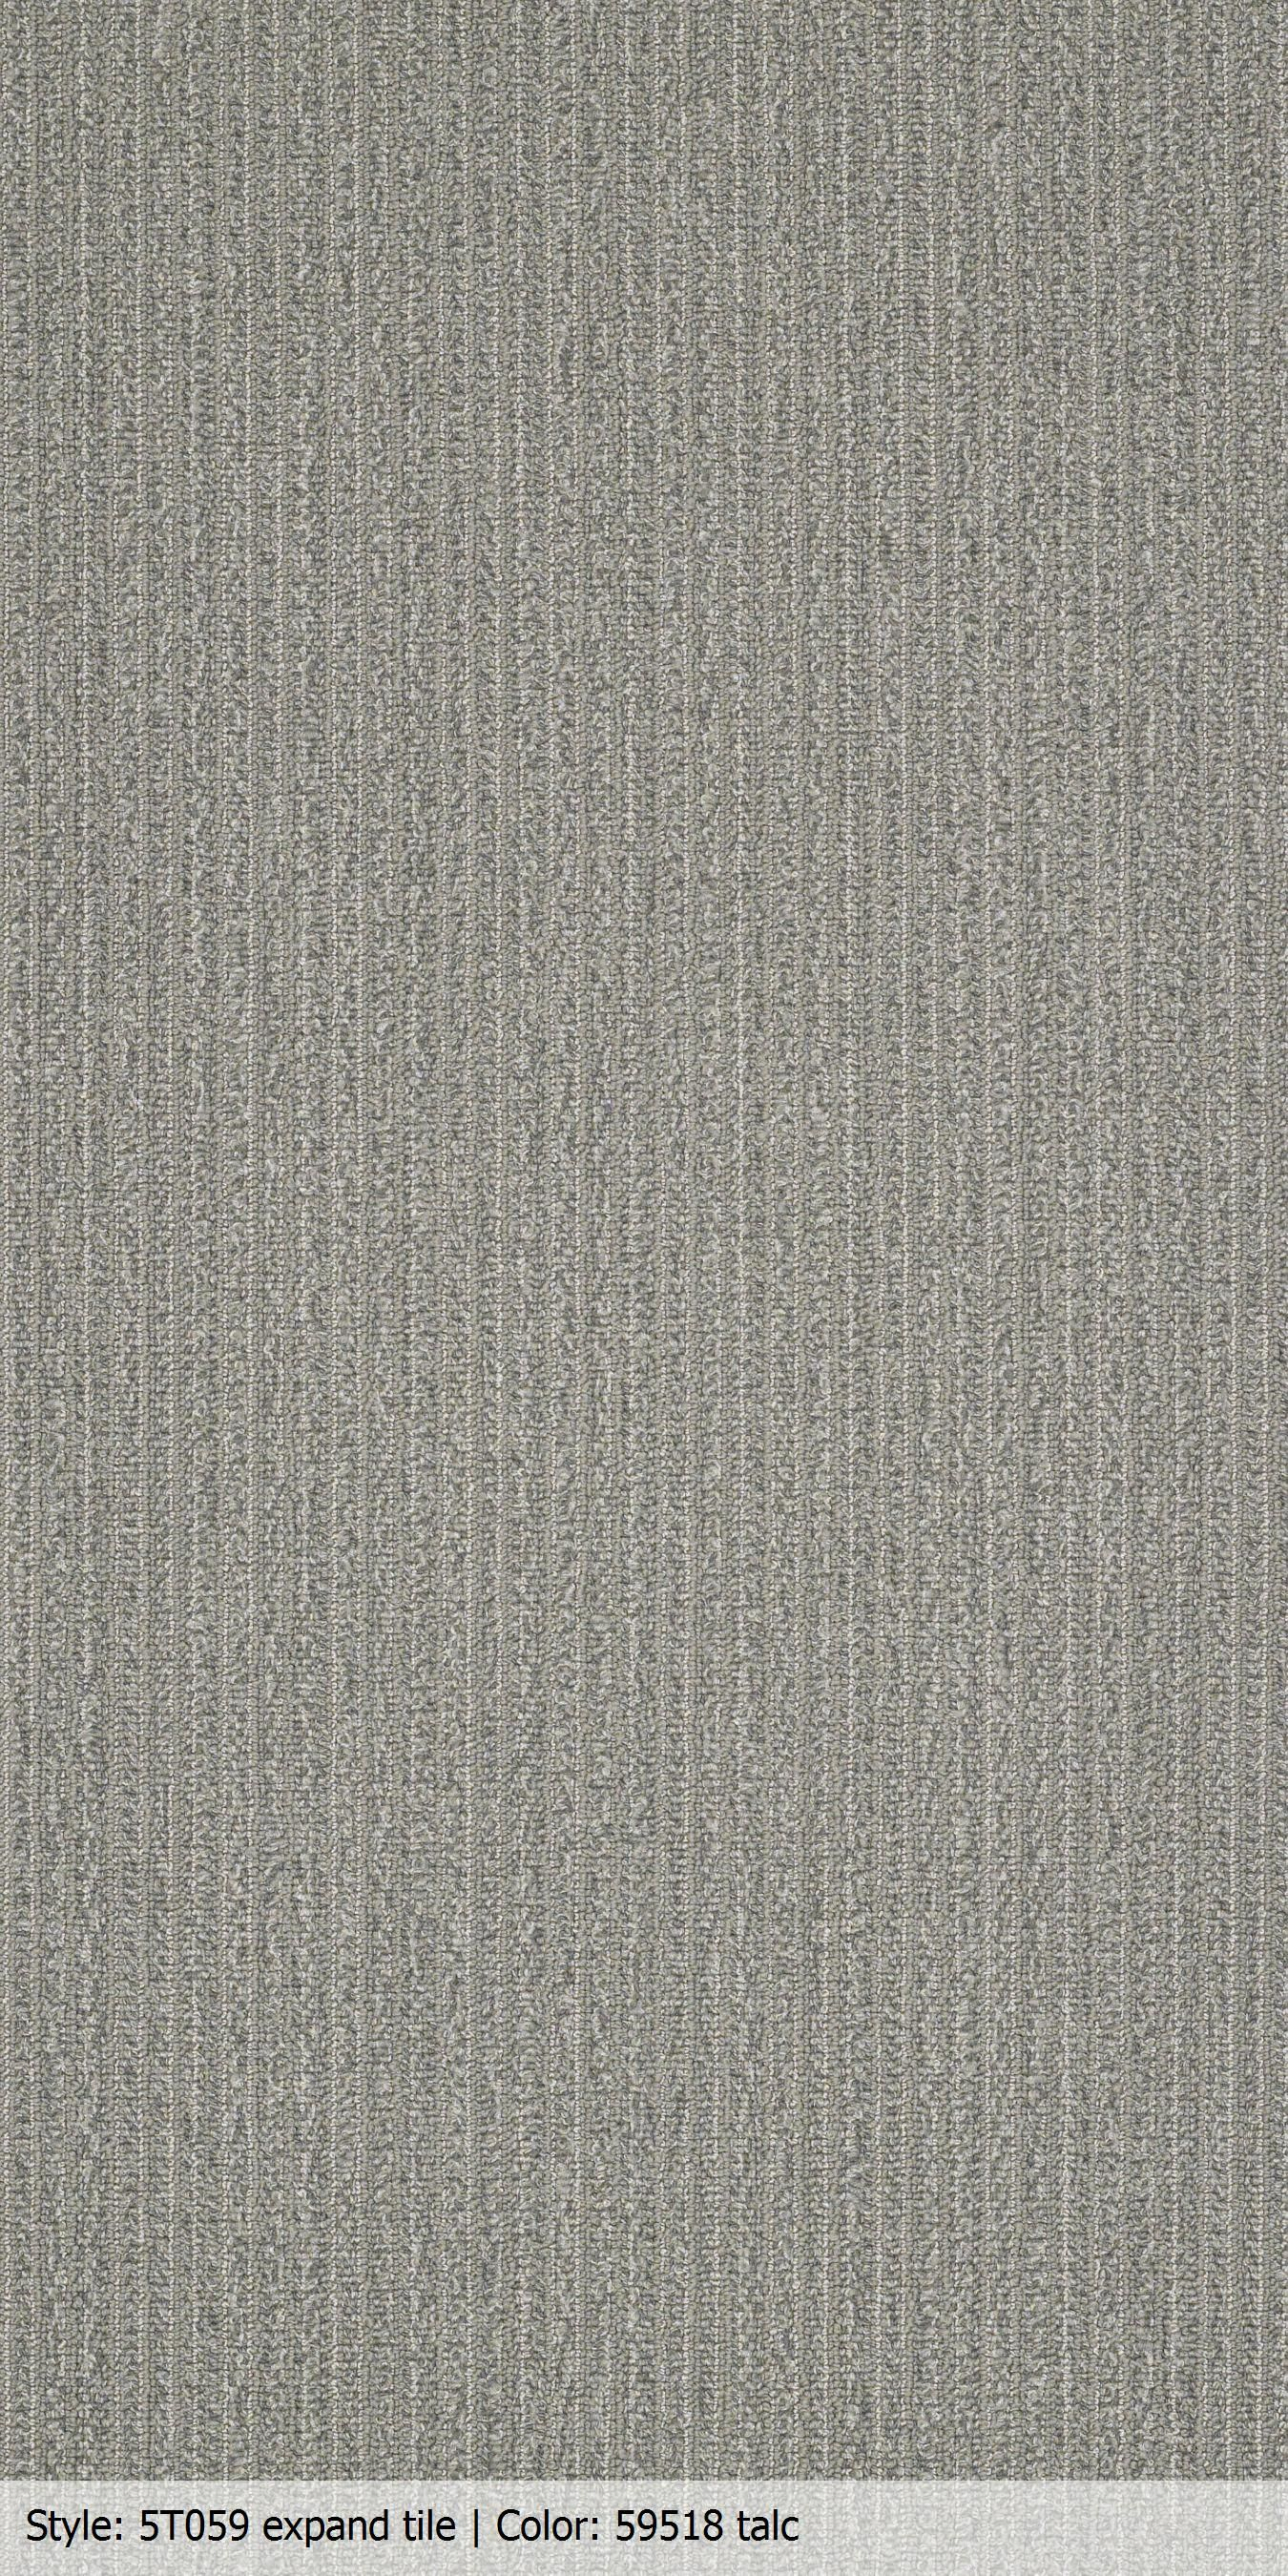 Pin By Dongjieqiong On Light Grey Carpet Tiles Carpet Tiles Rugs On Carpet Carpet